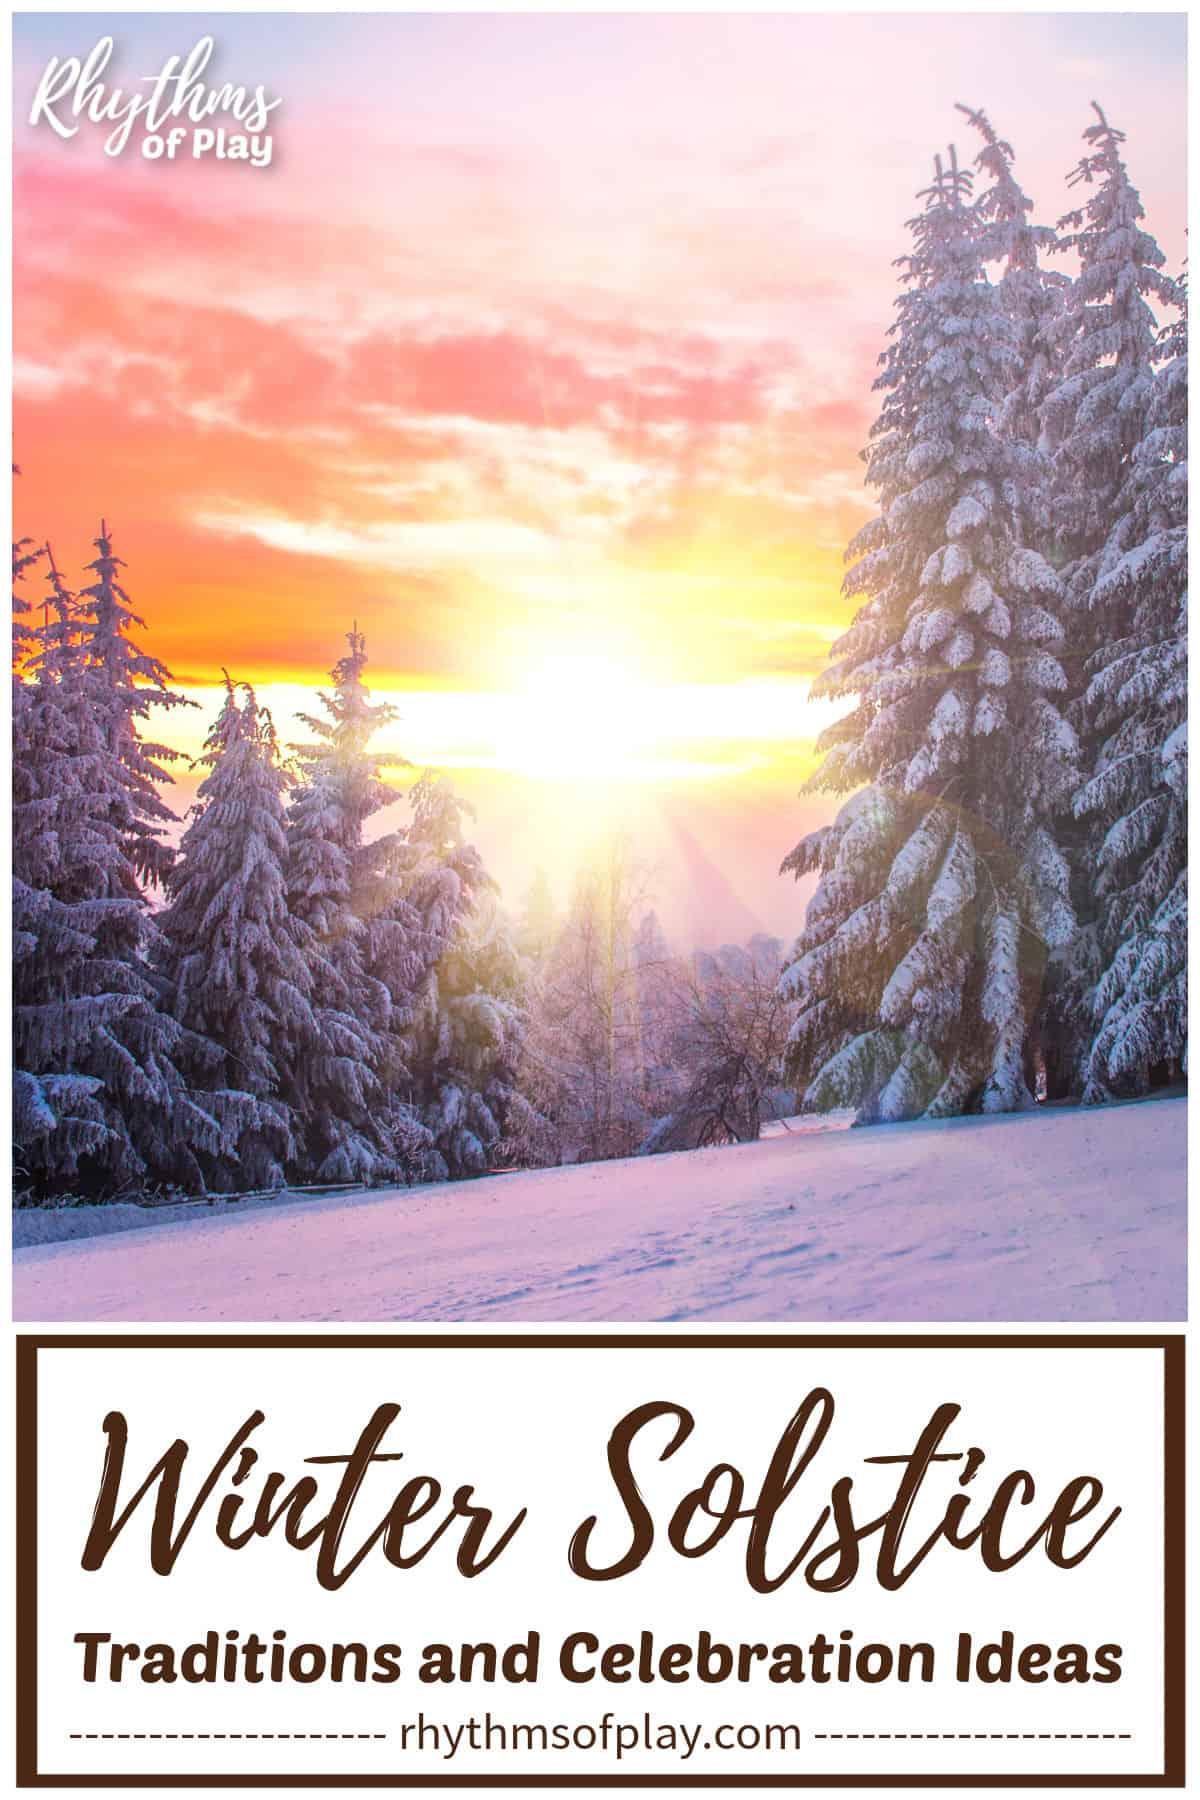 Traditional winter solstice celebration ideas